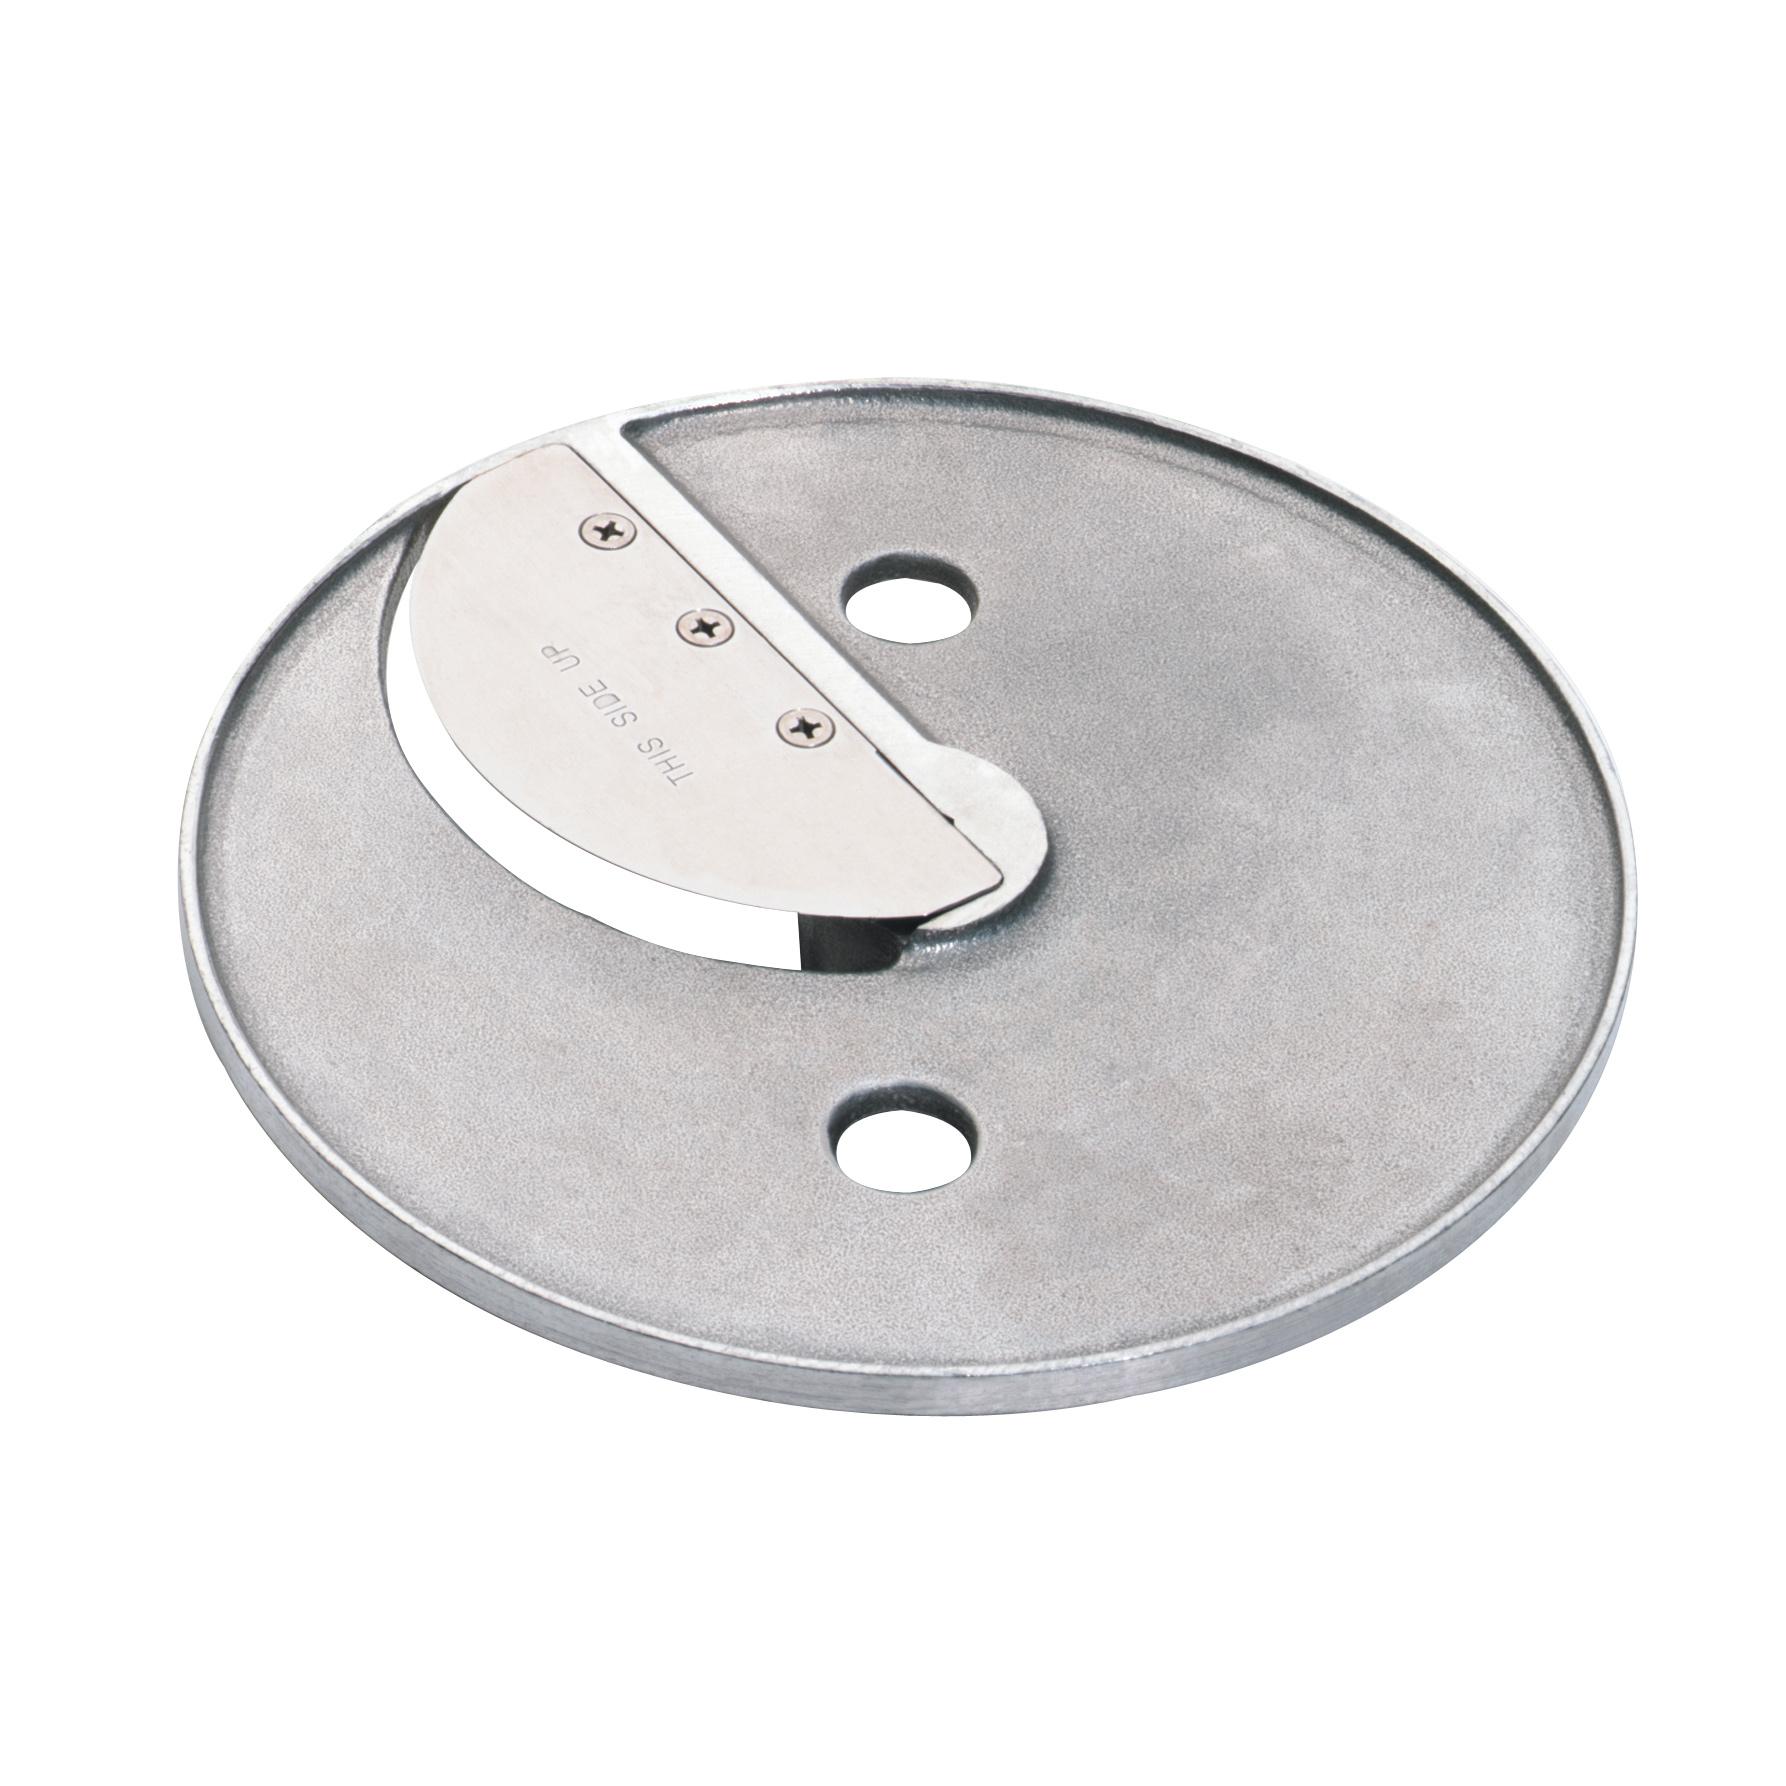 Waring CAF12 food processor, disc plate, slicing